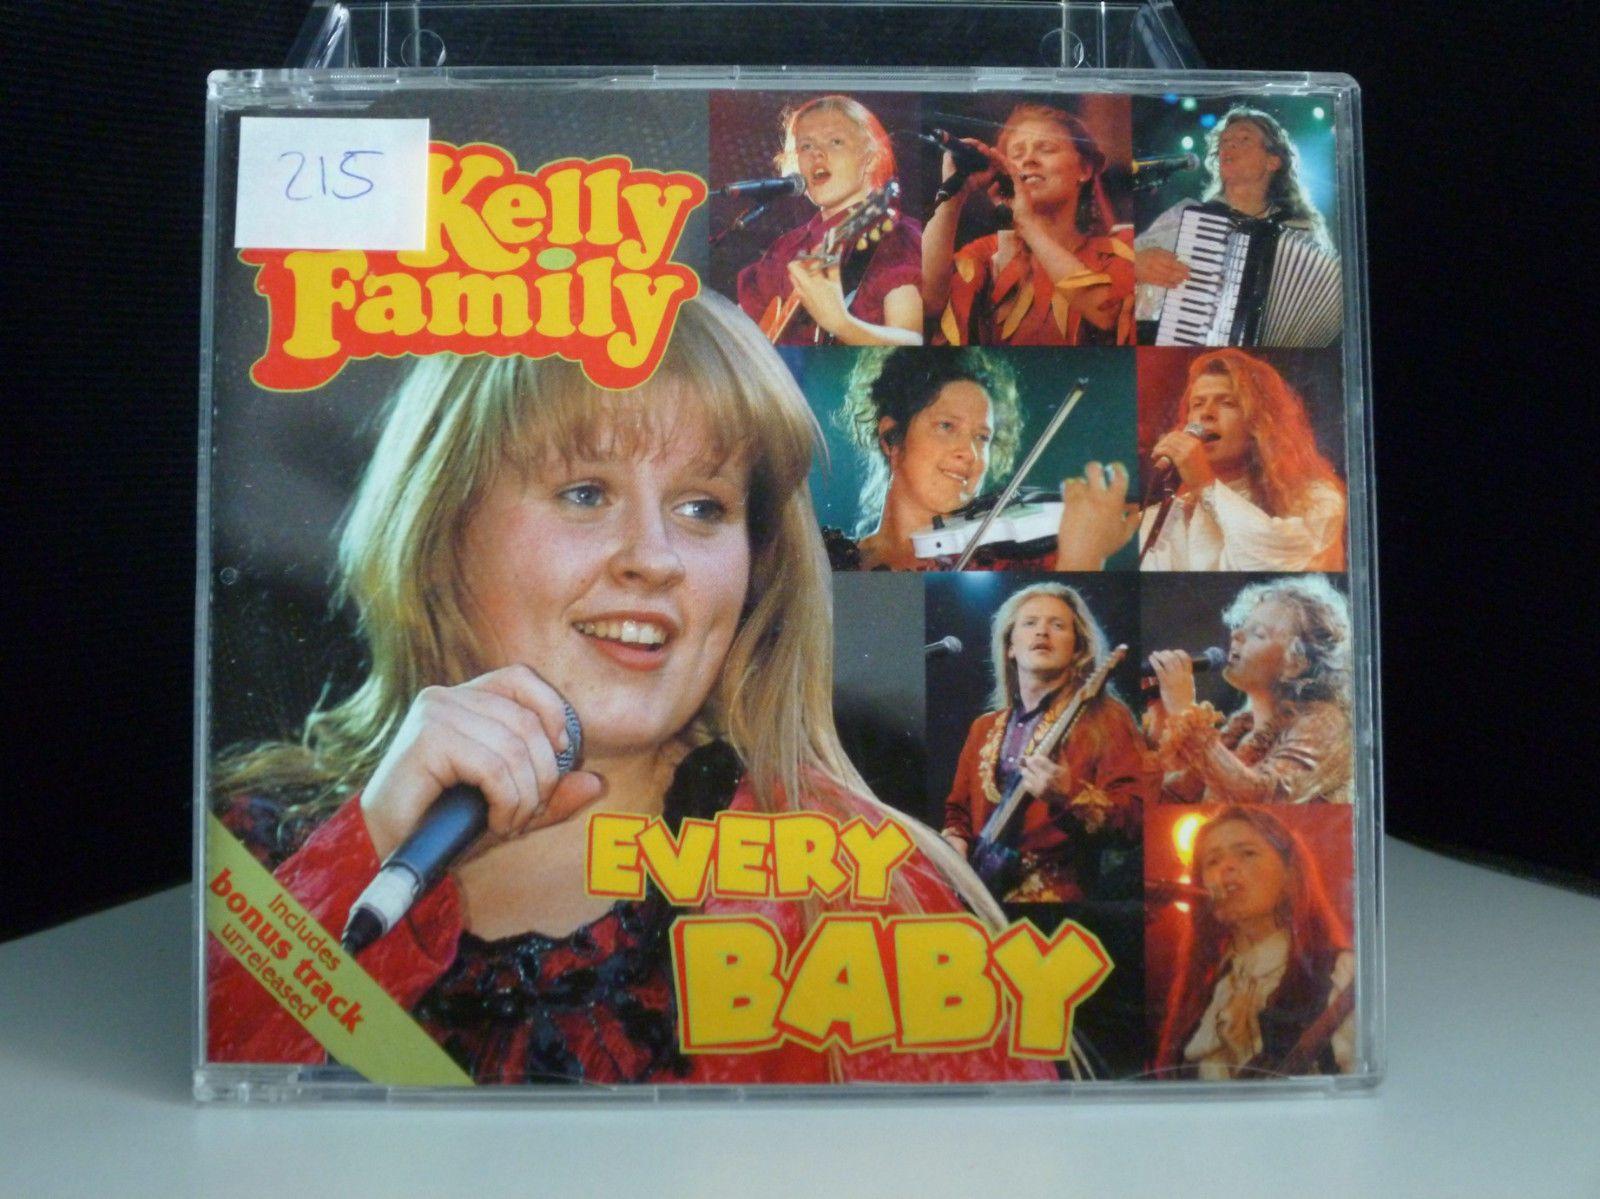 The Kelly Family Every Baby Maxi Single Cd Musik Dance Pop Rock Folk